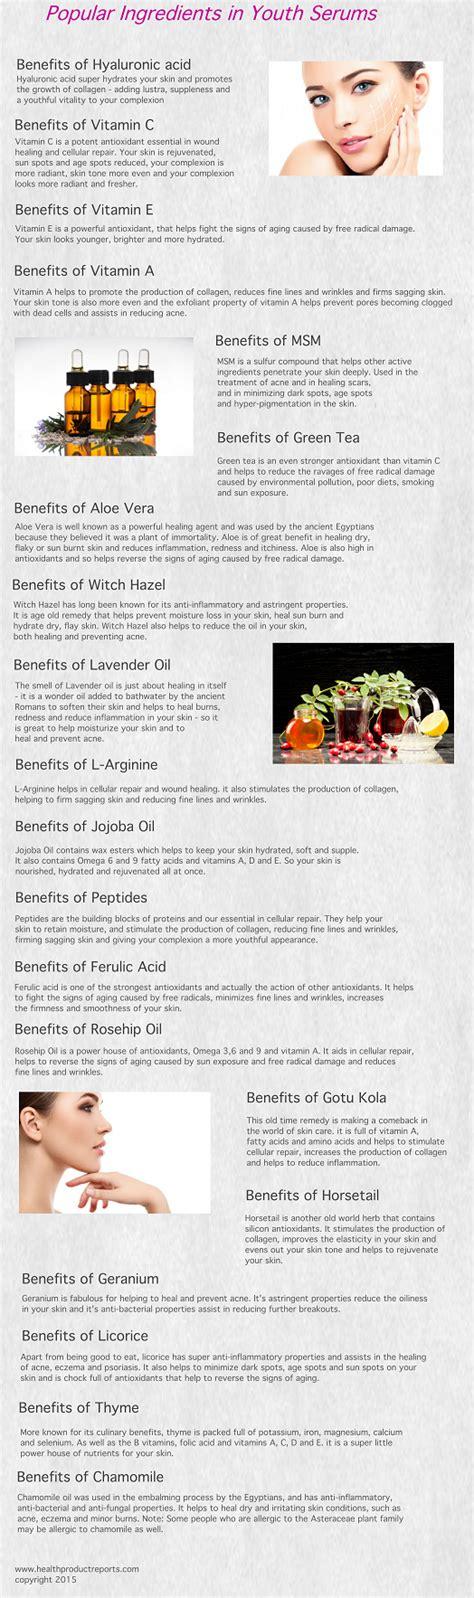 hyaluronic acid serum reviews ingredients infographic